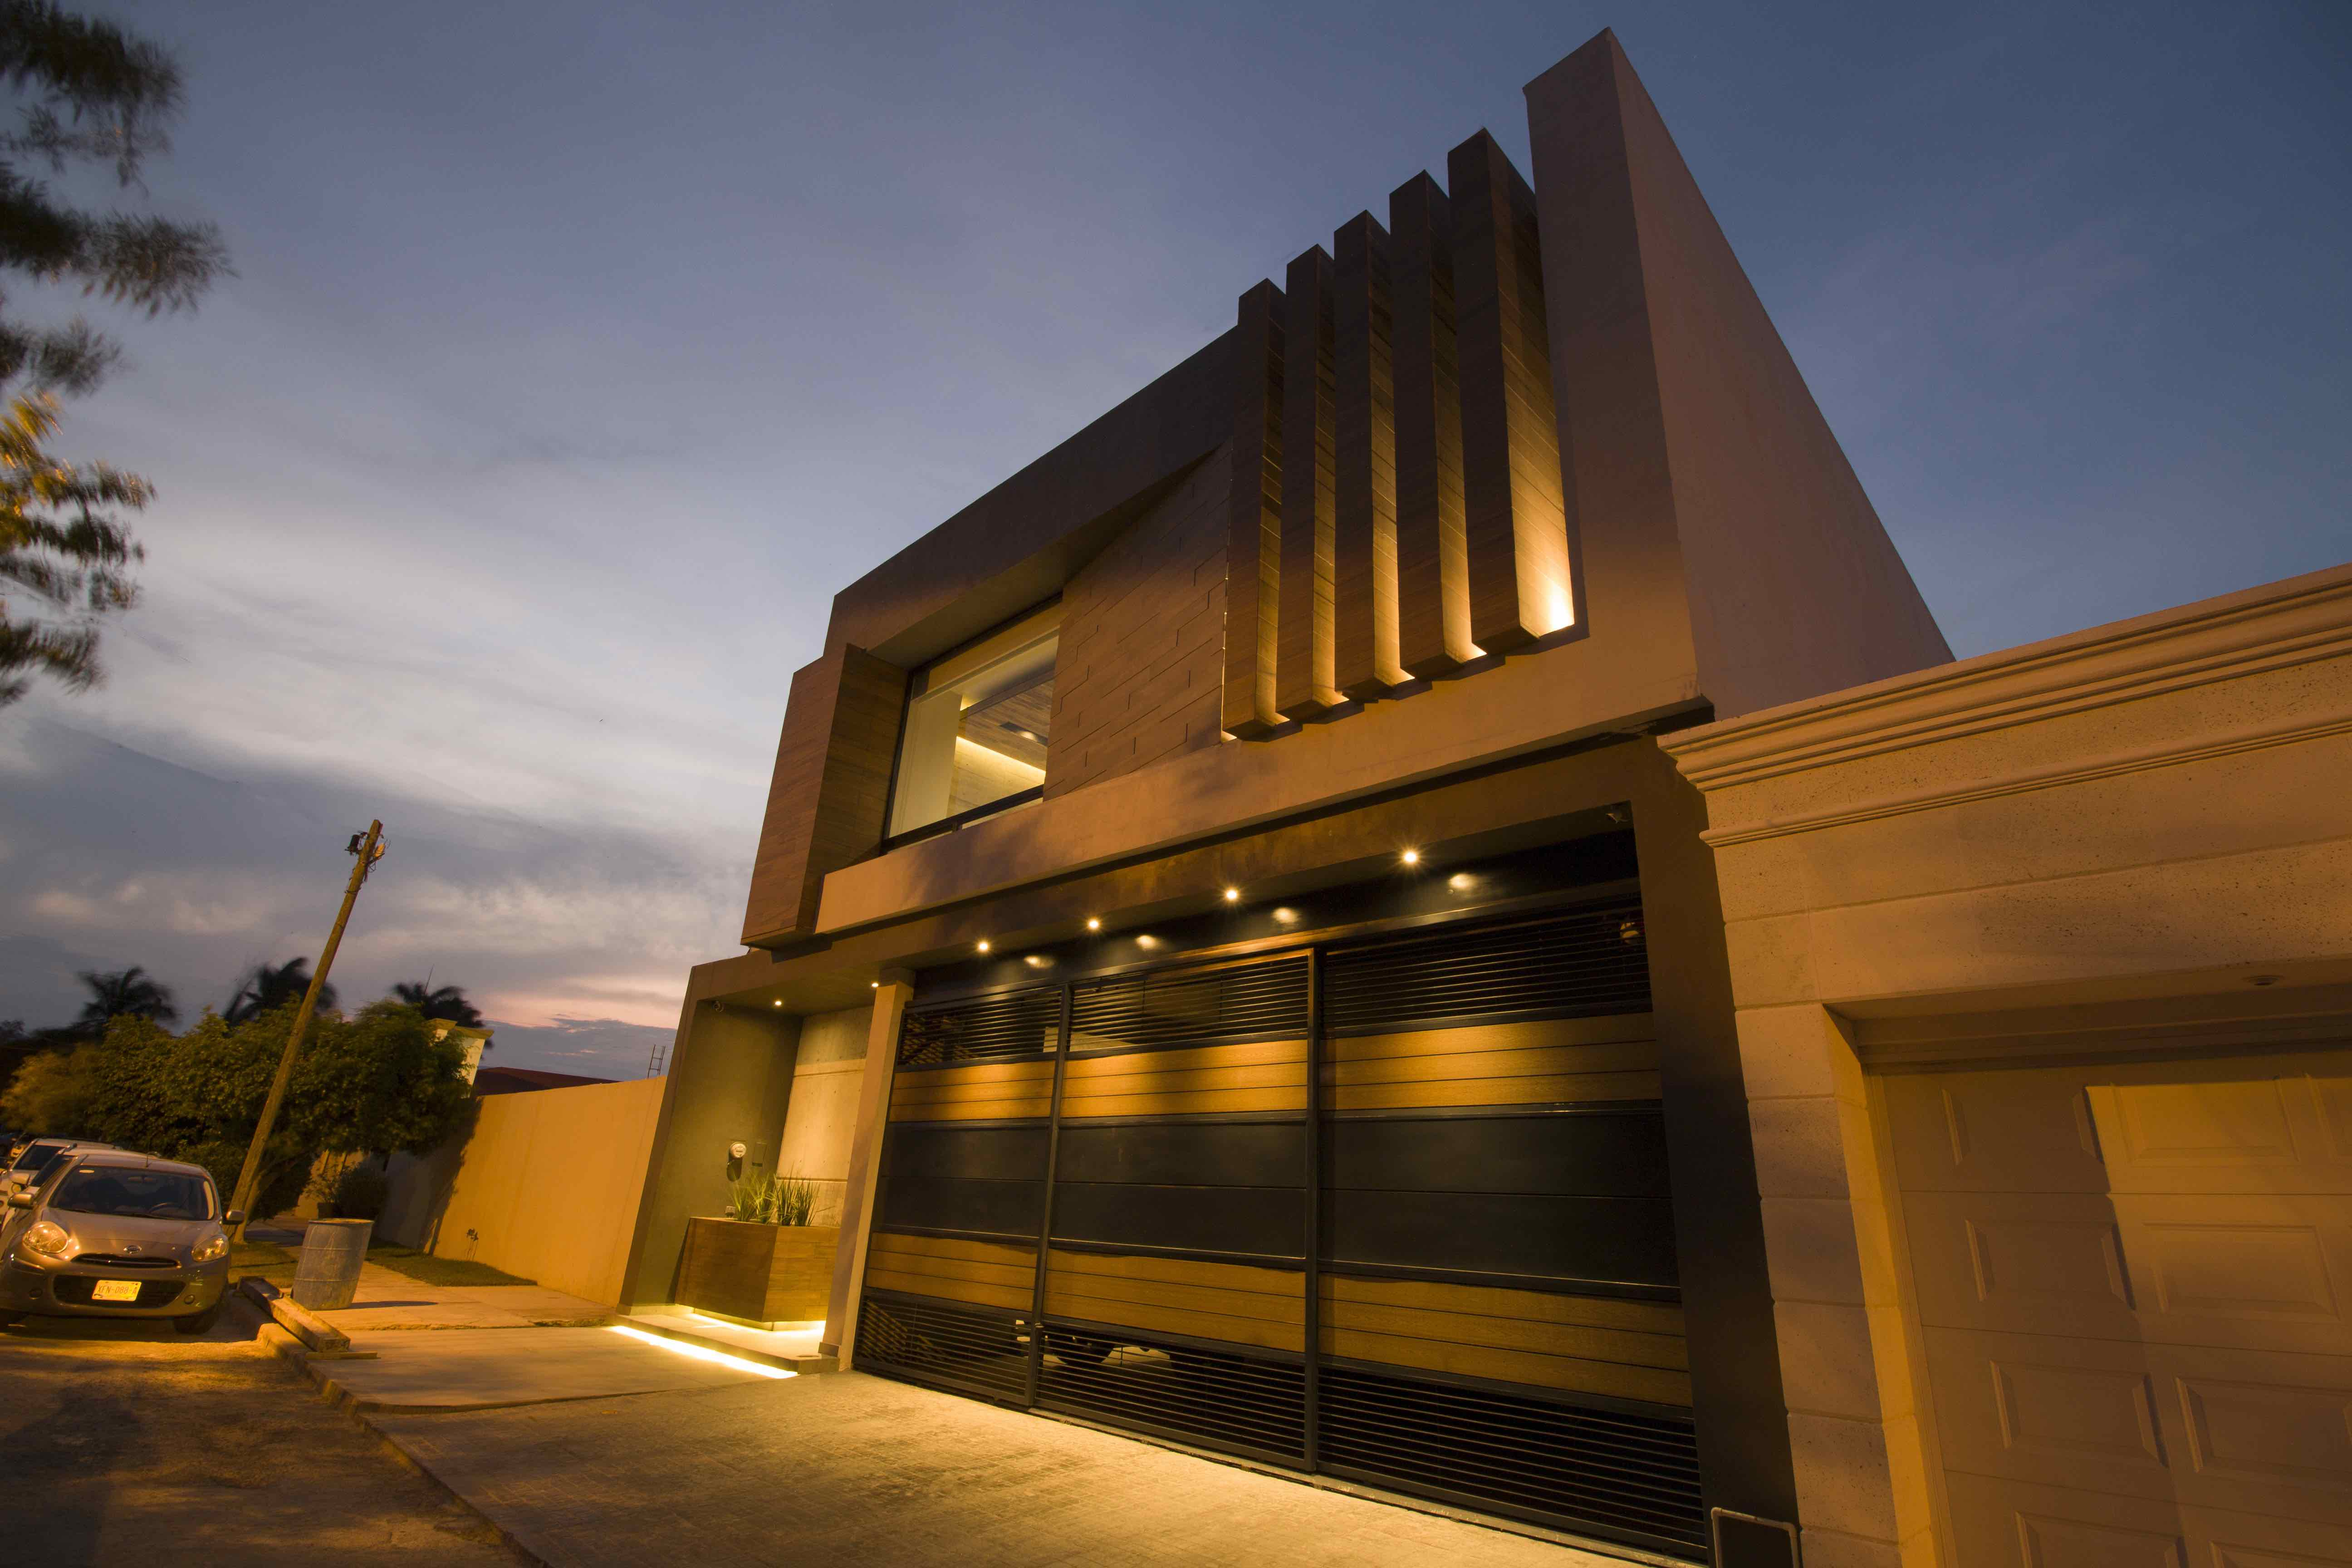 GR_House_Gallardo_arquitectura_amazingarchitecture_mexico_001.jpg